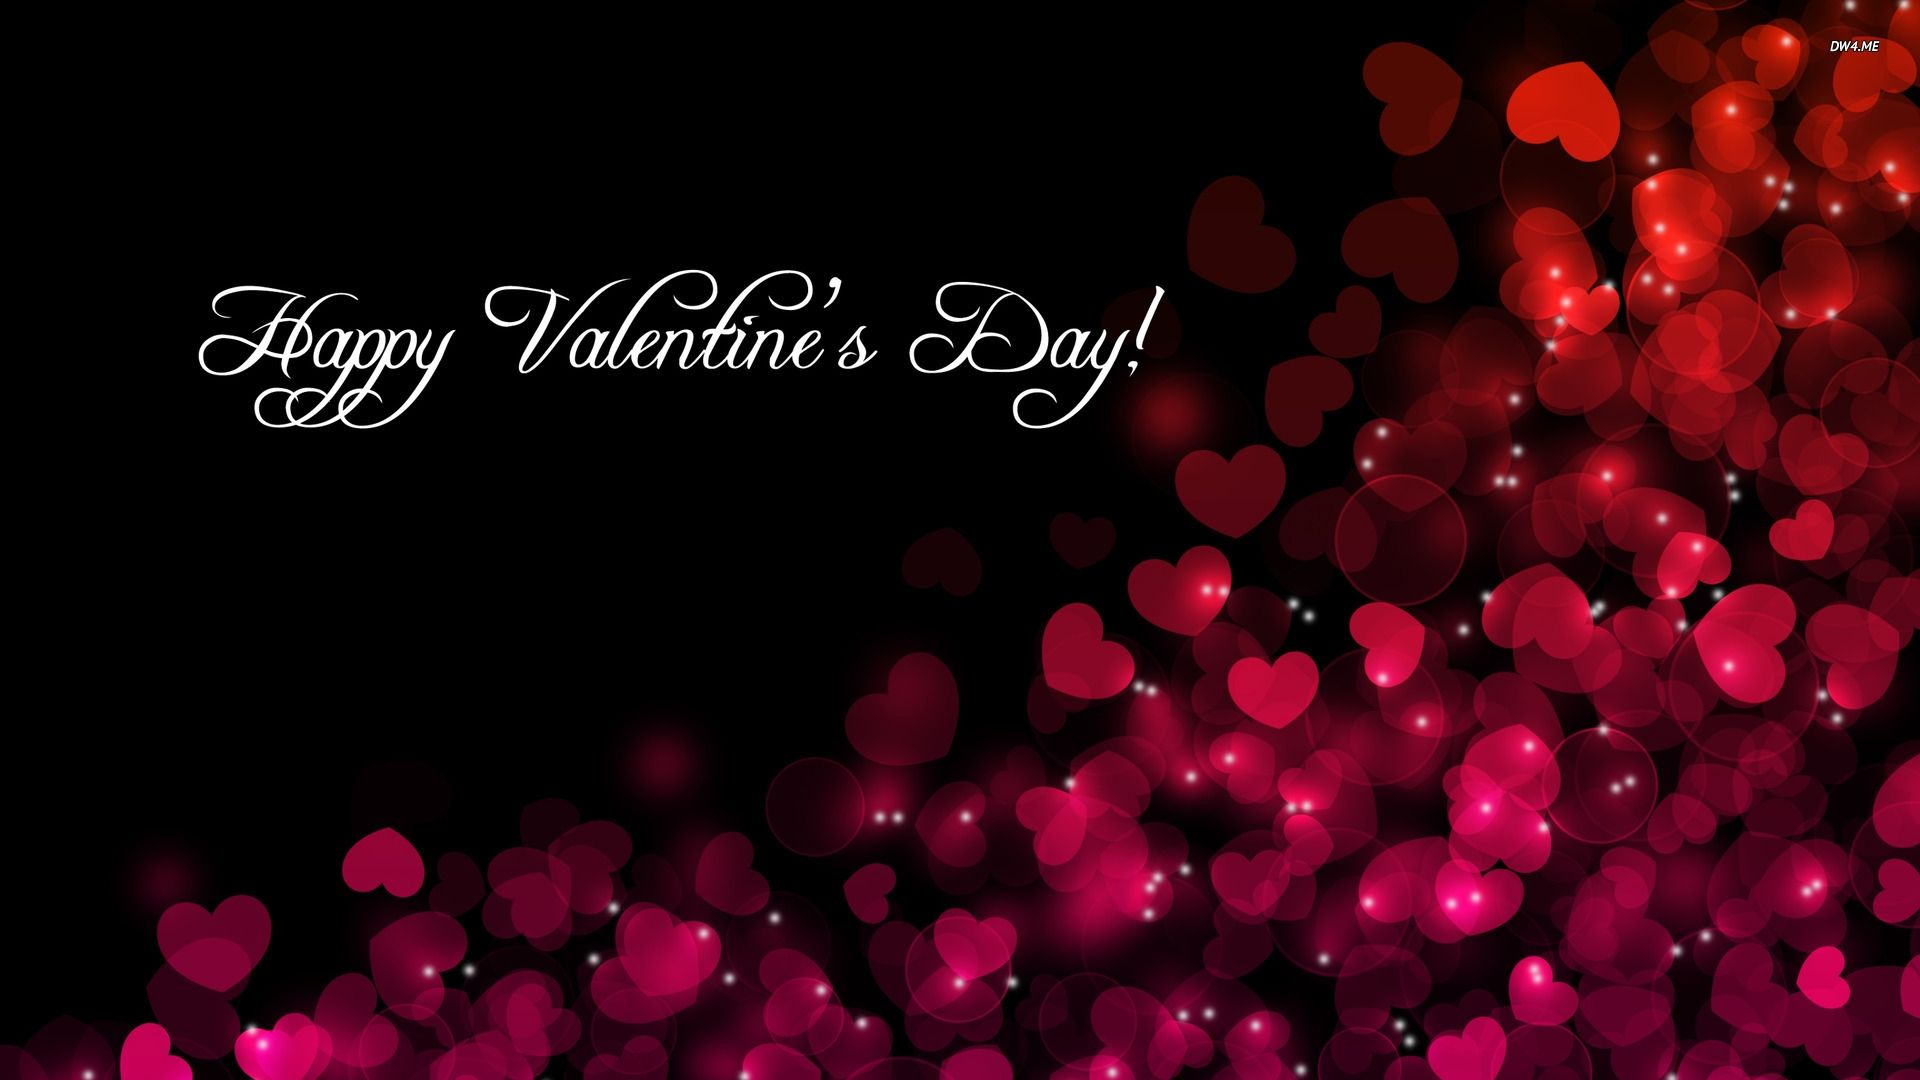 Valentine S Day Desktop Wallpapers Top Free Valentine S